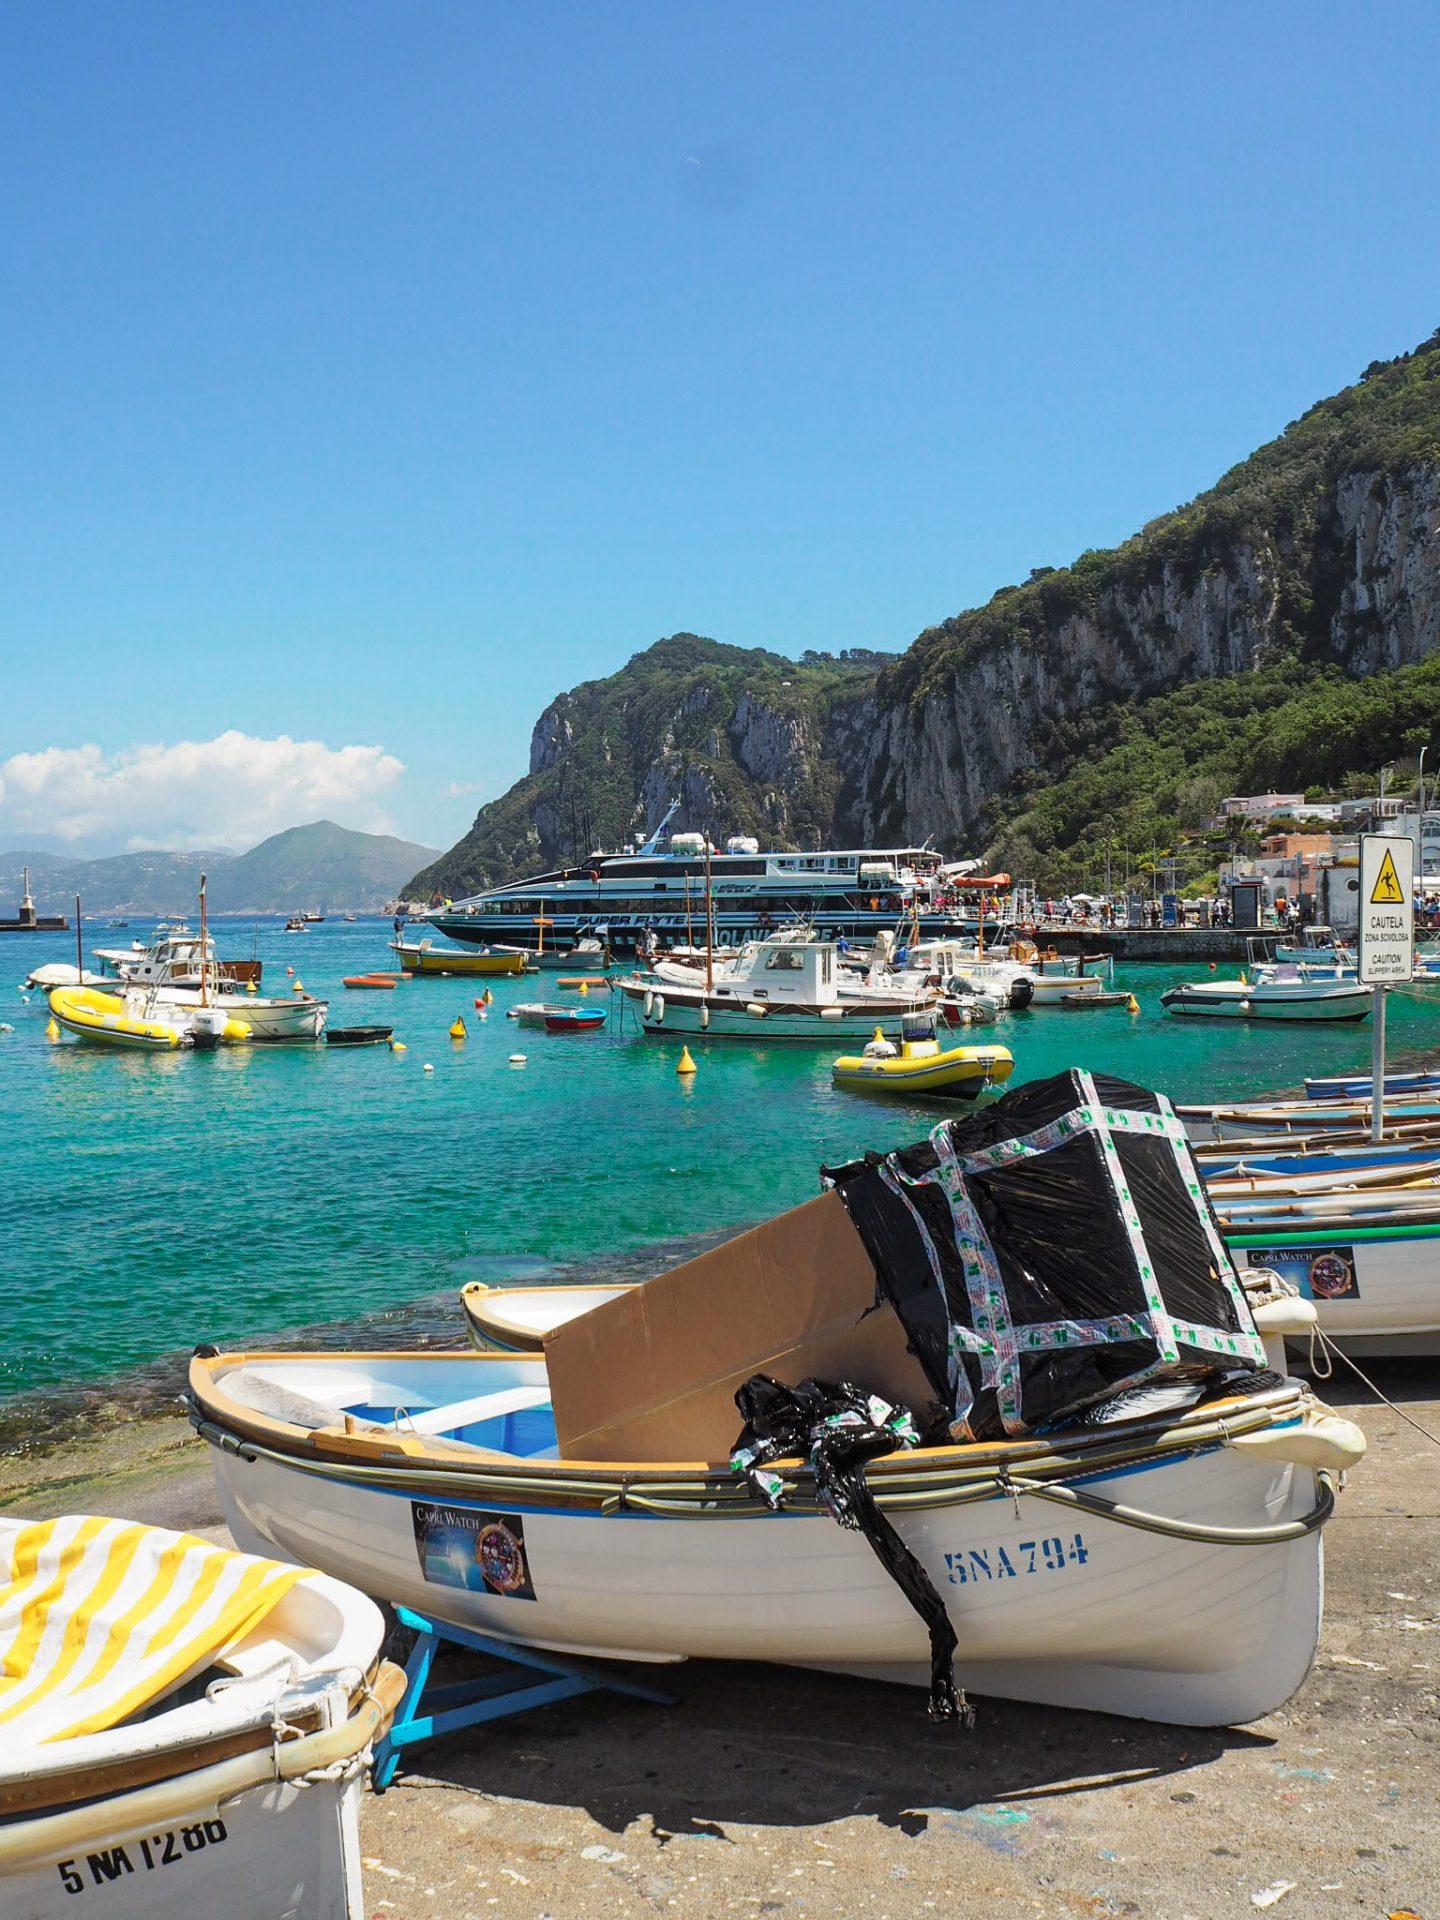 Sorrento travel: capri island boats